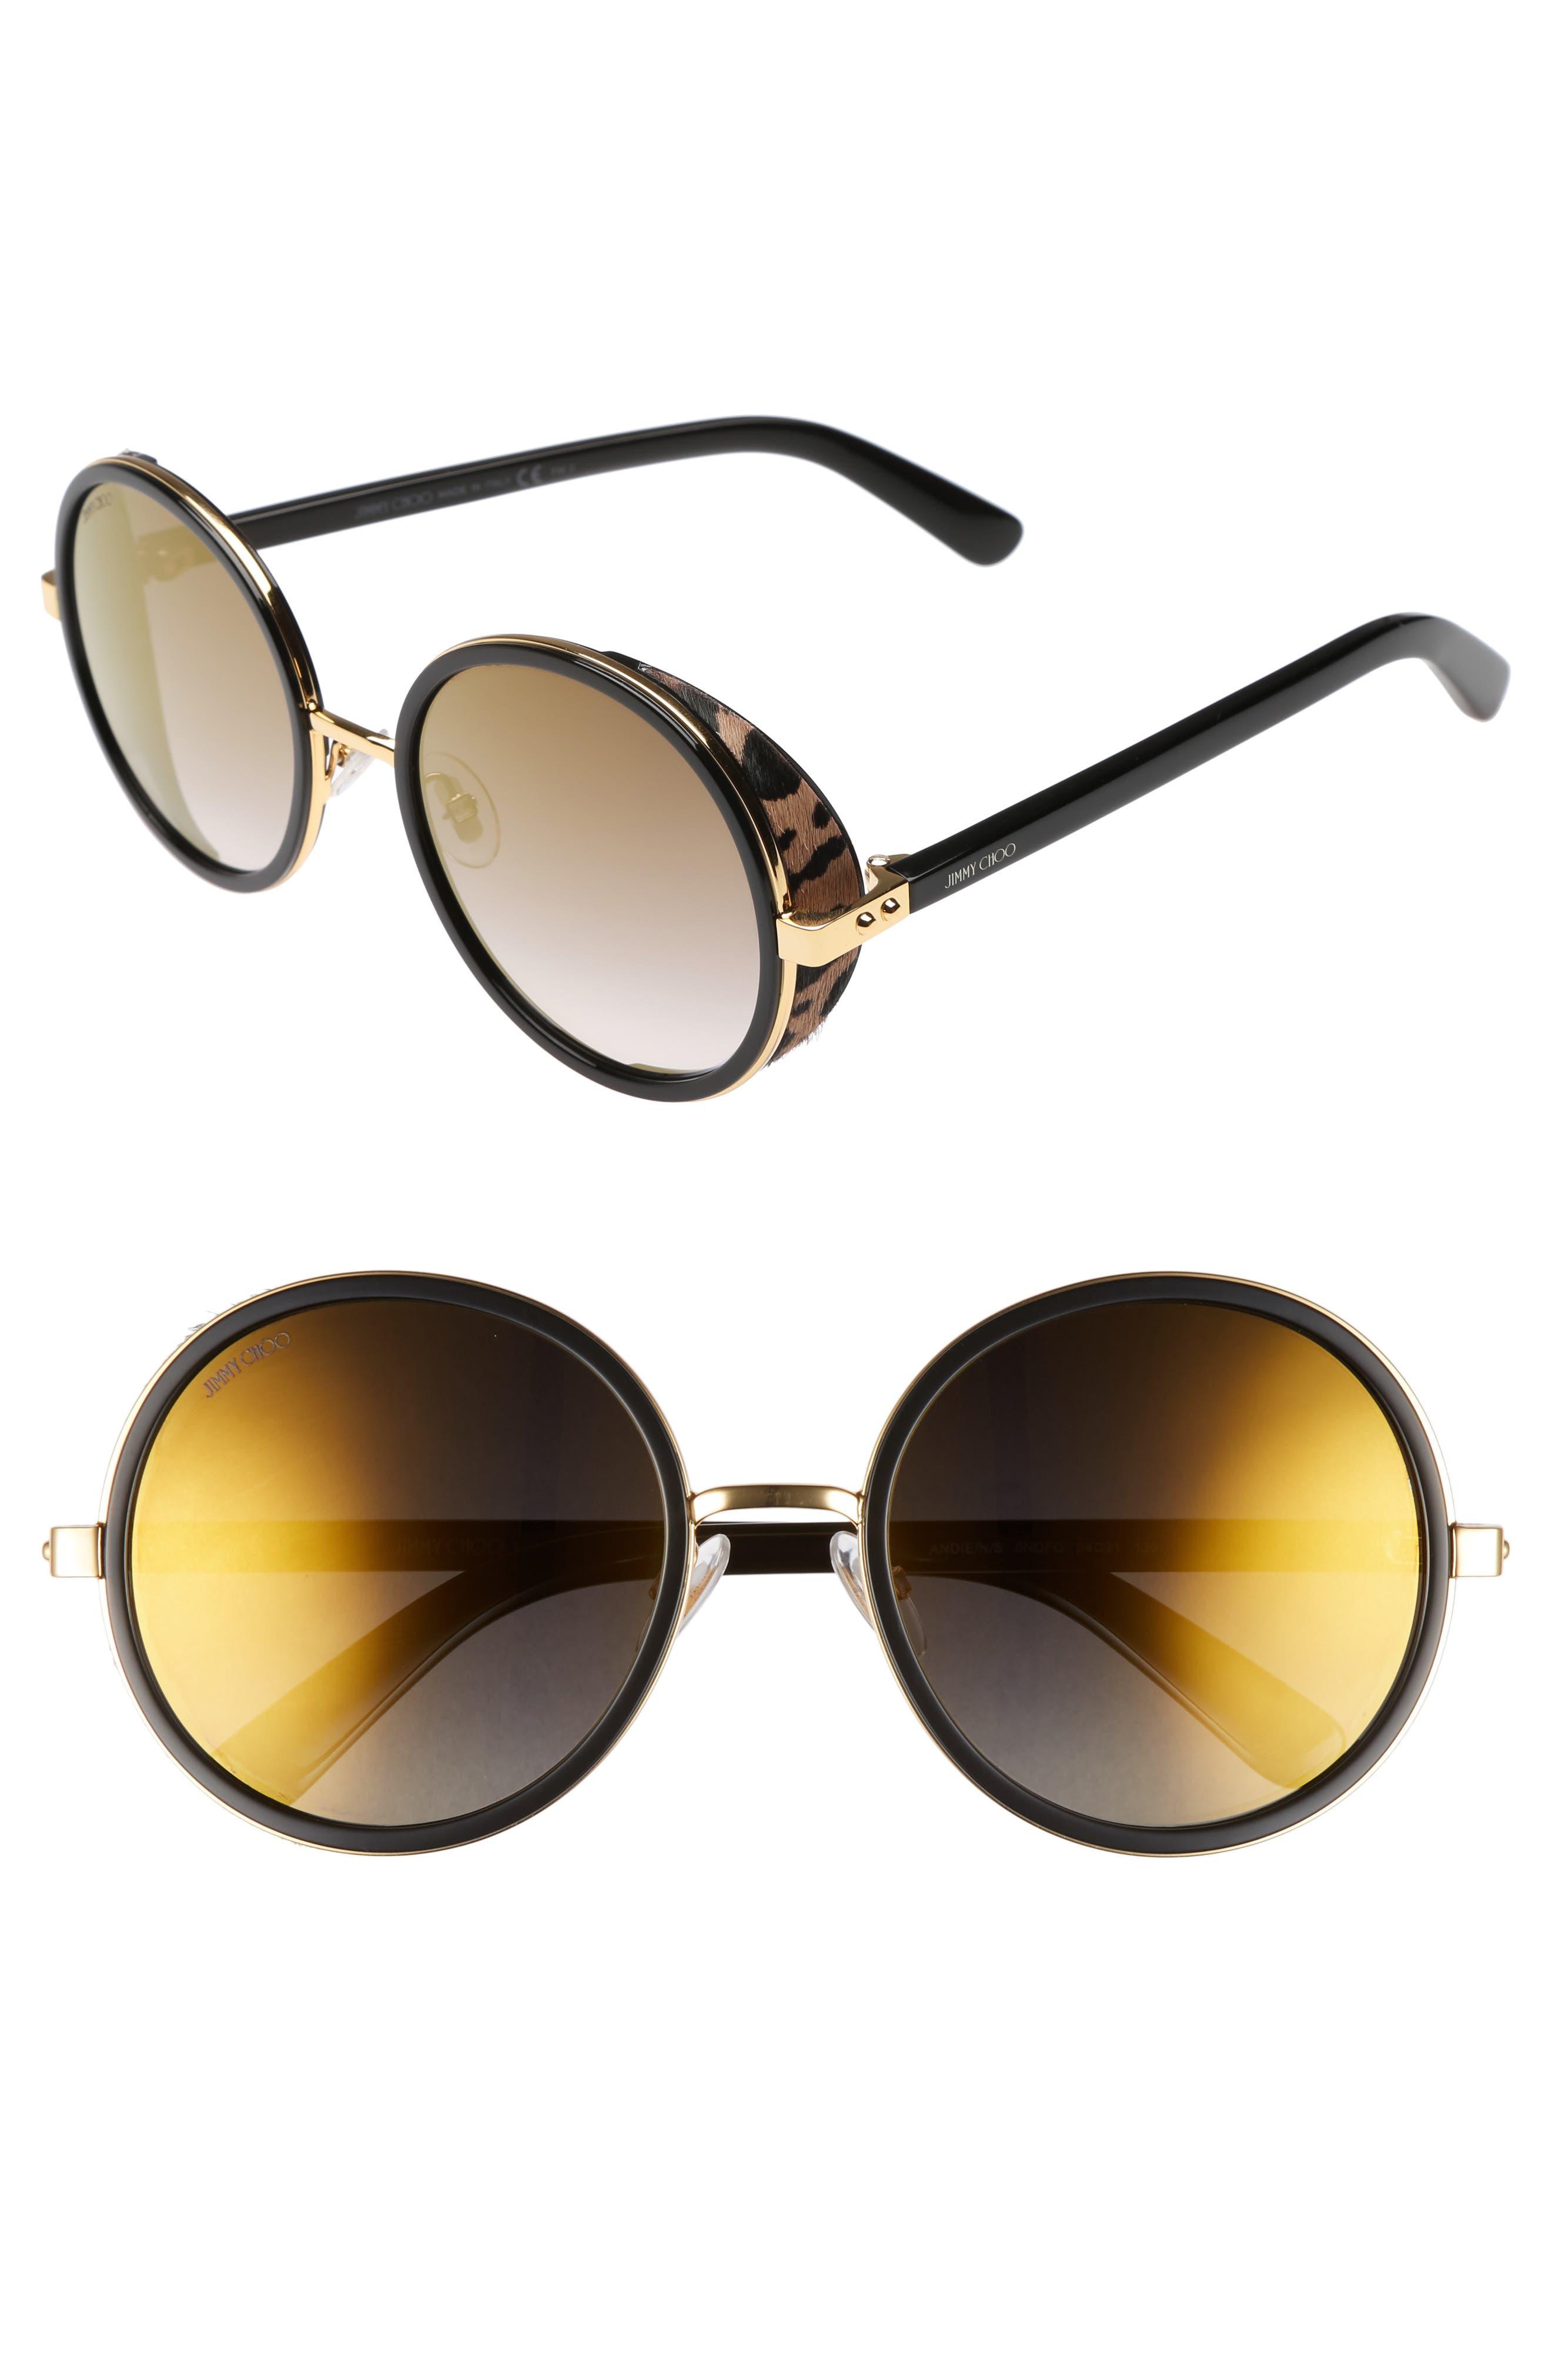 Main Image - Jimmy Choo Andiens 54mm Round Sunglasses